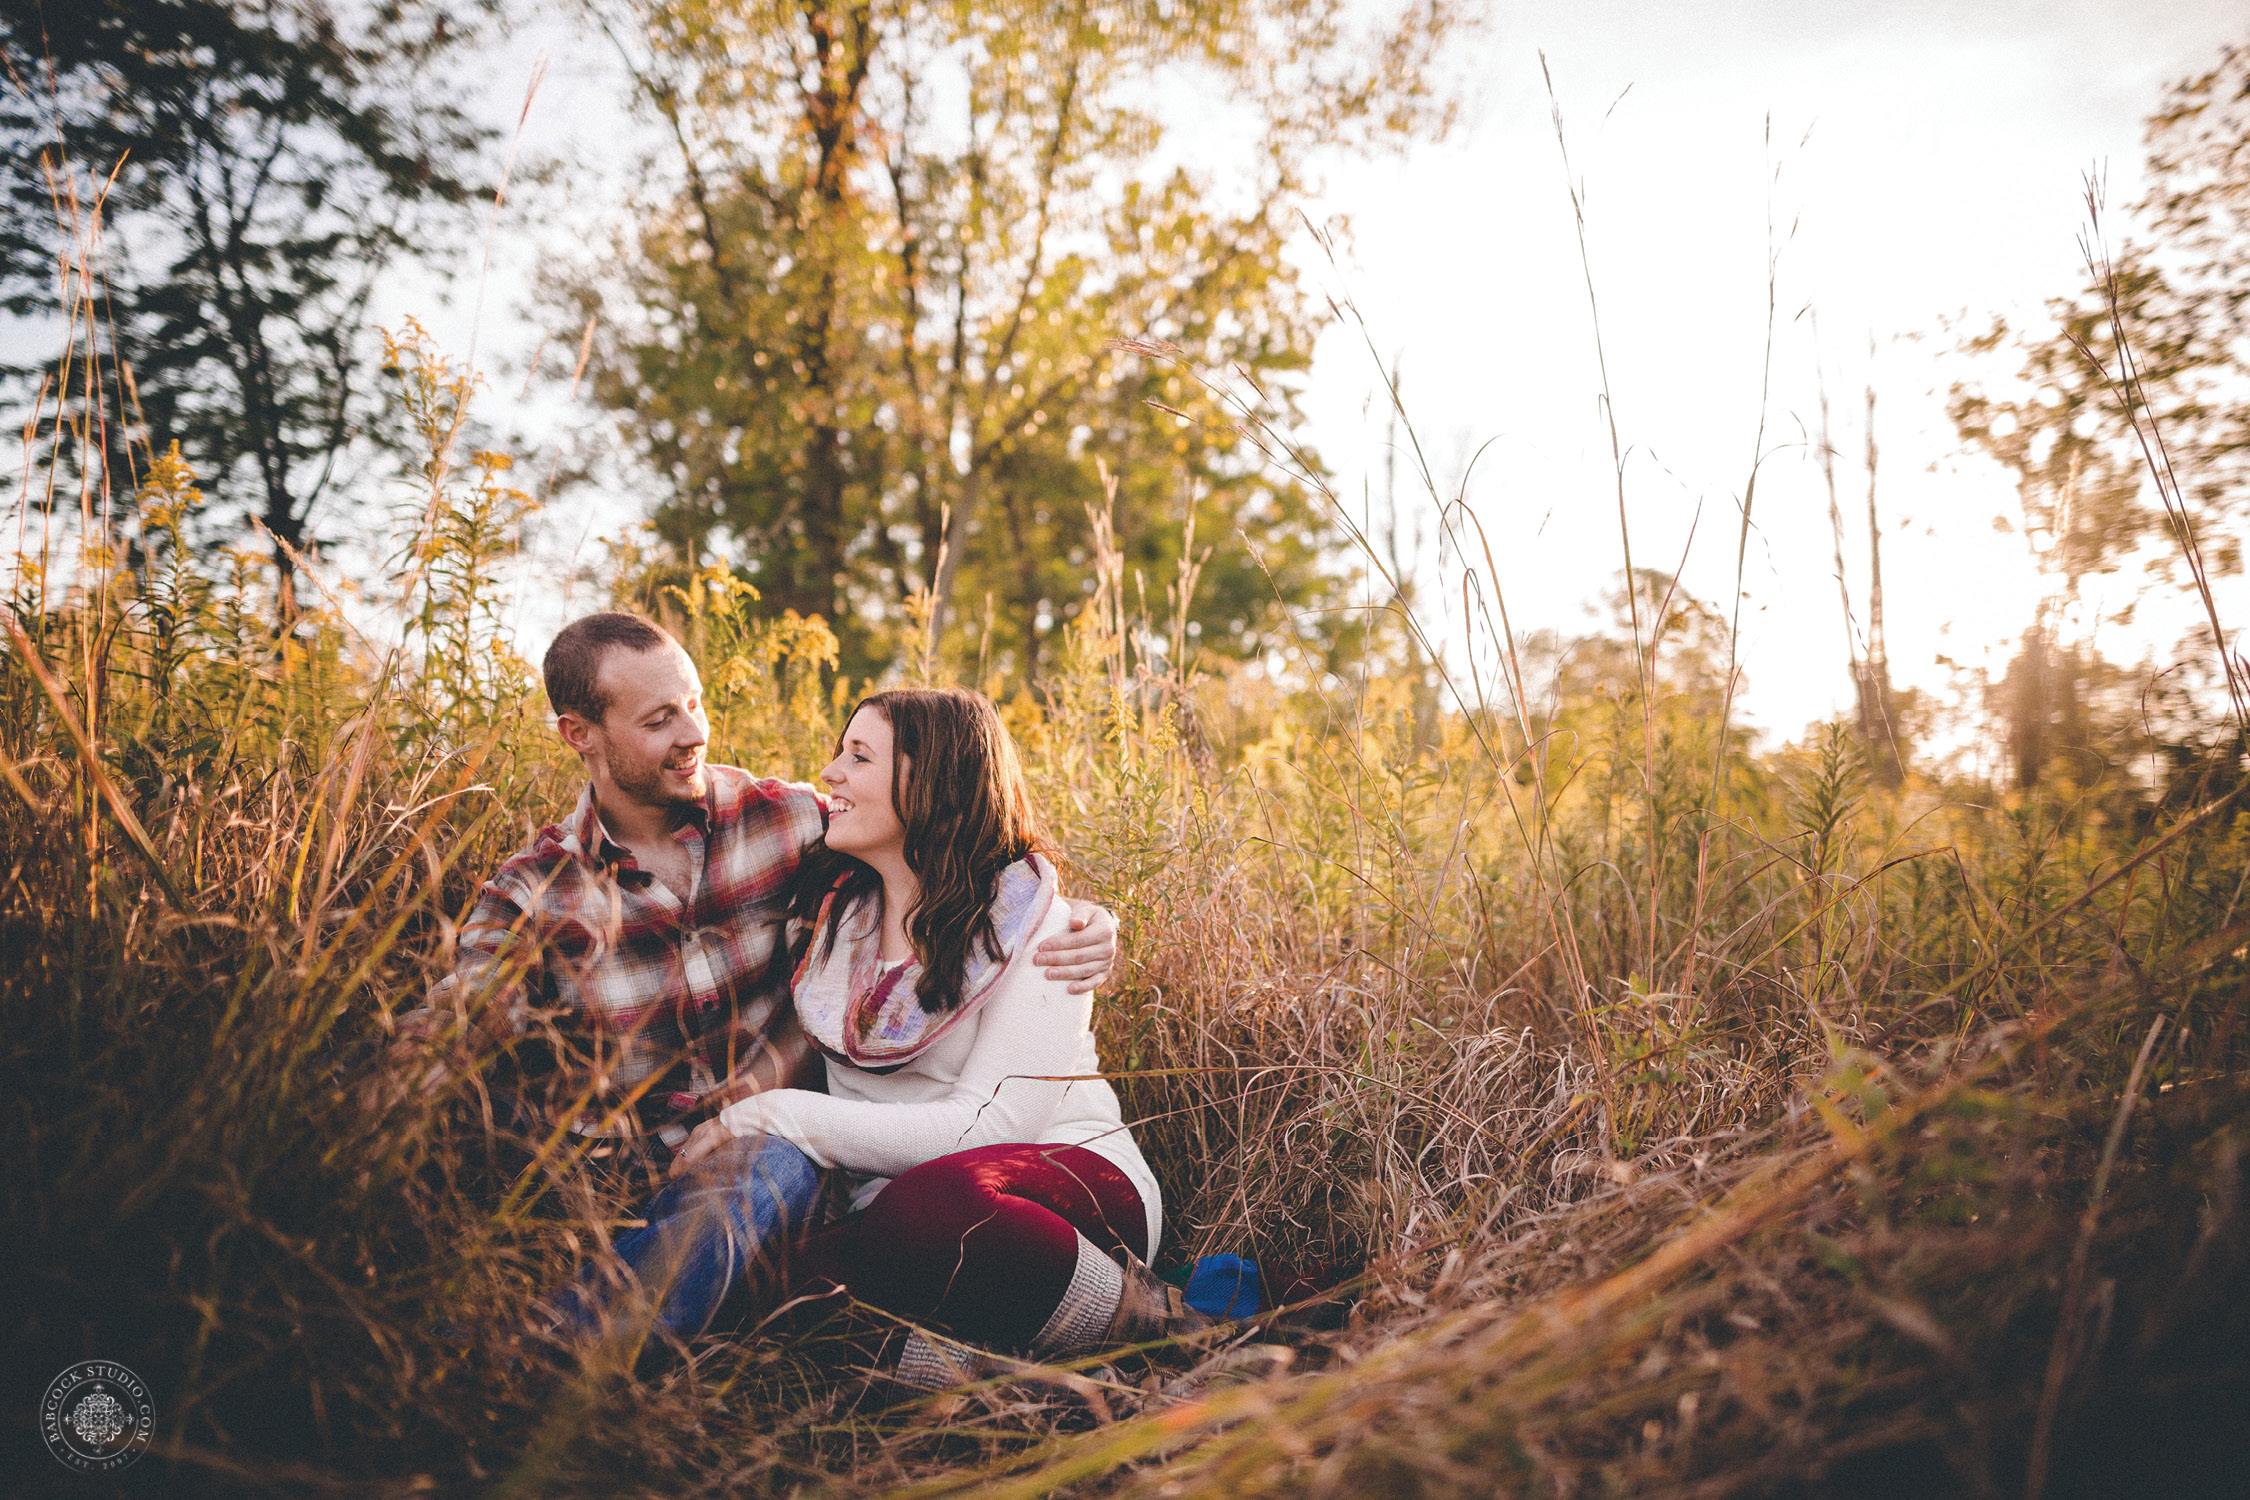 kristen-tom-engagement-photographer-dayton-ohio-fb-5.jpg